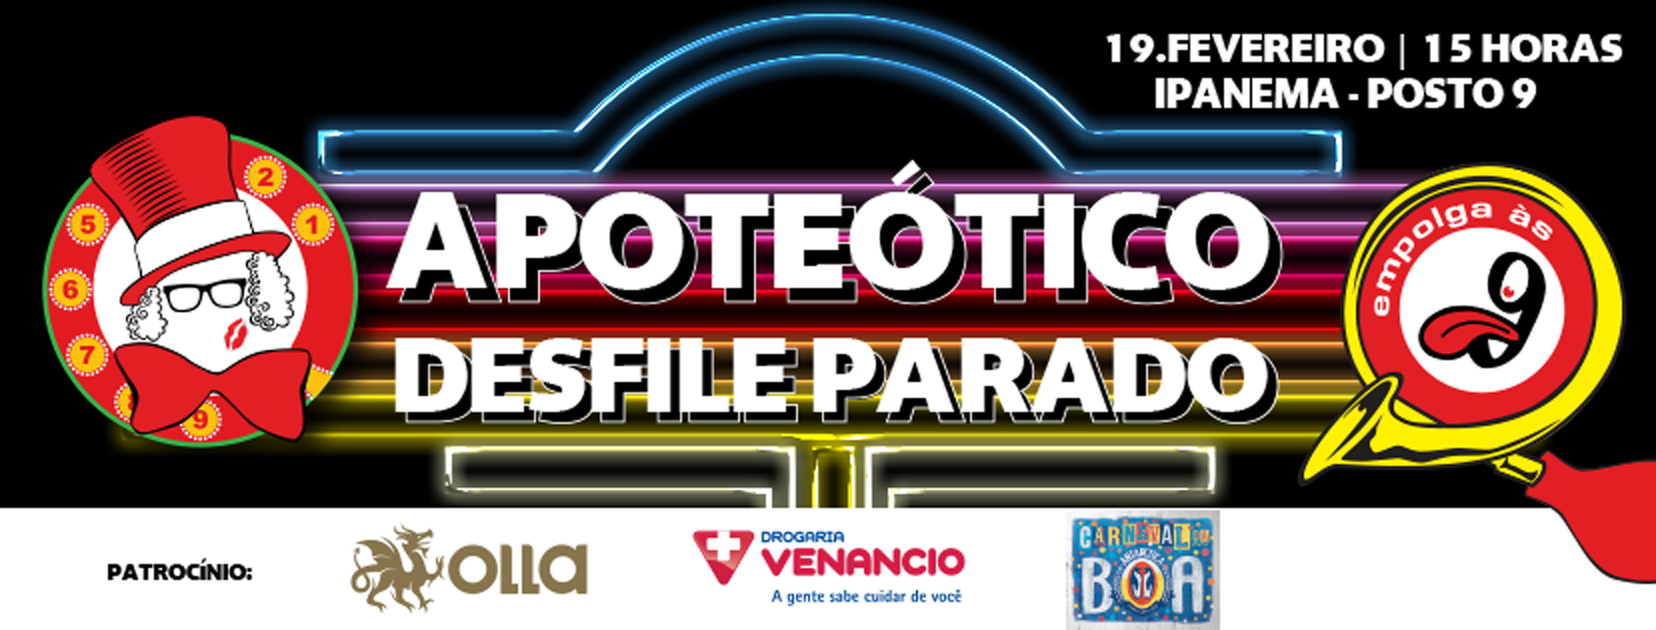 Carnaval 2017 - Apoteótico Desfile Parado